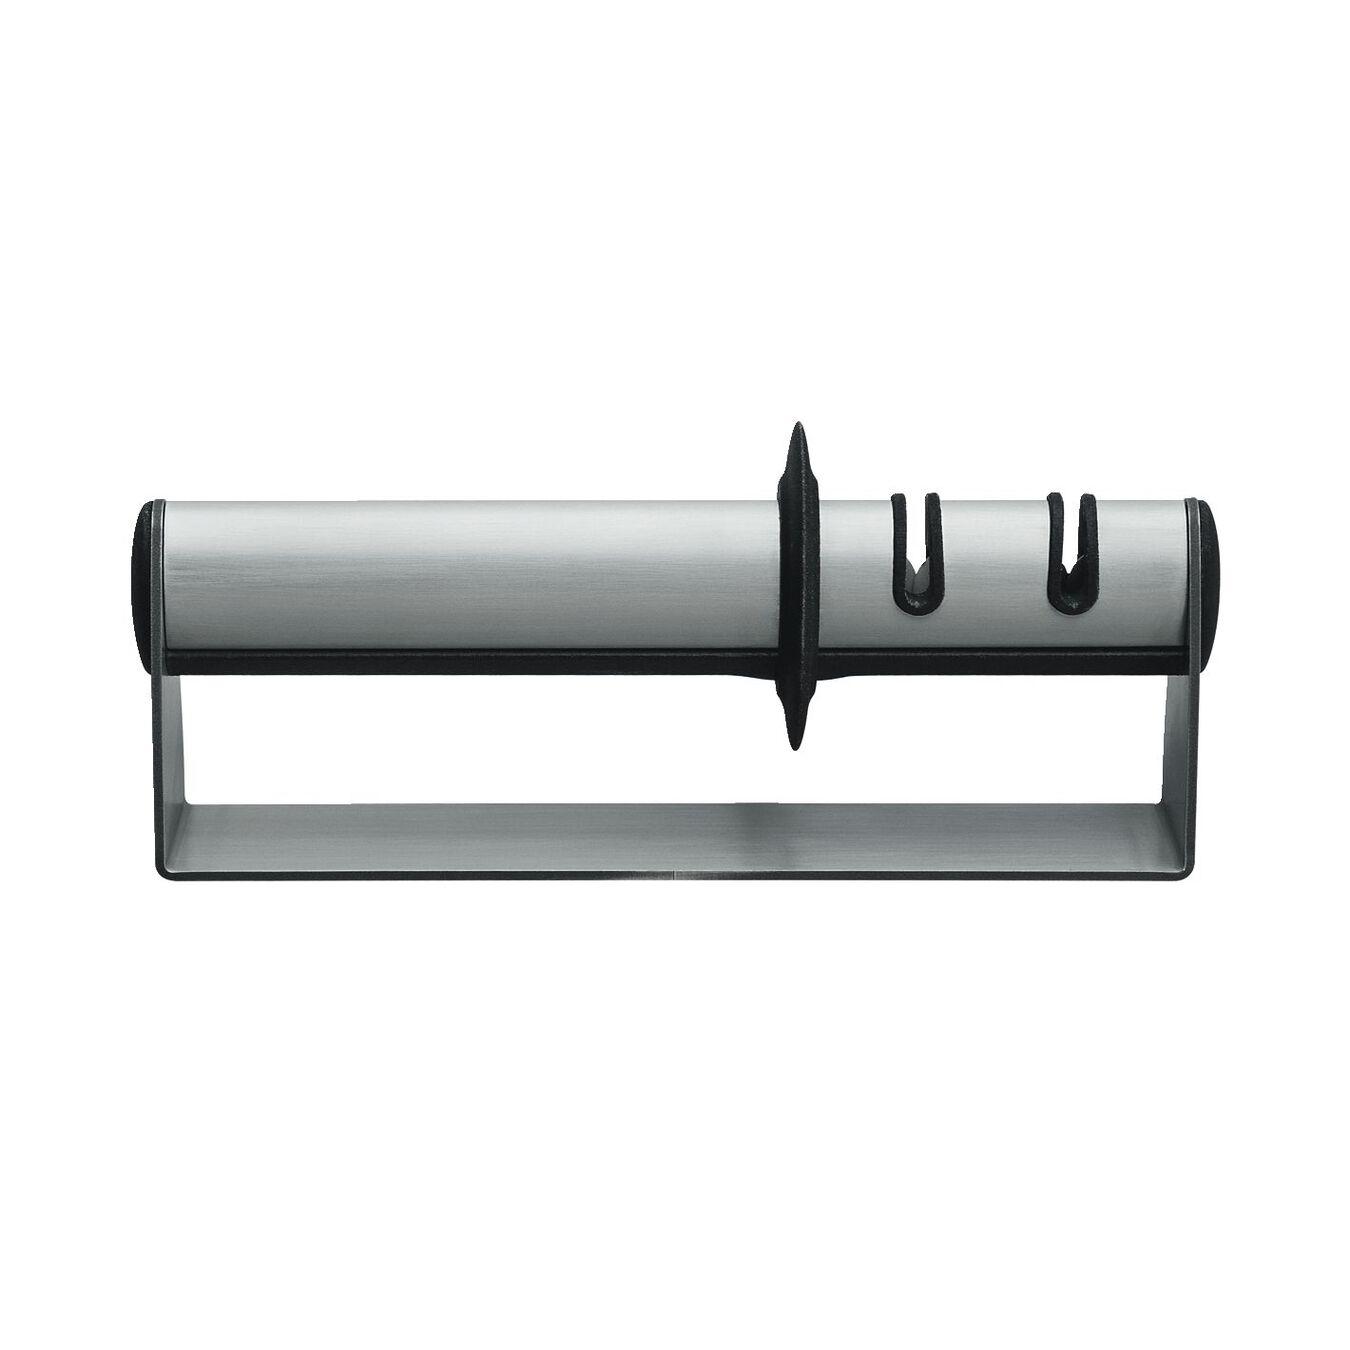 TWINSHARP Select - 19 cm, acciaio inox,,large 1